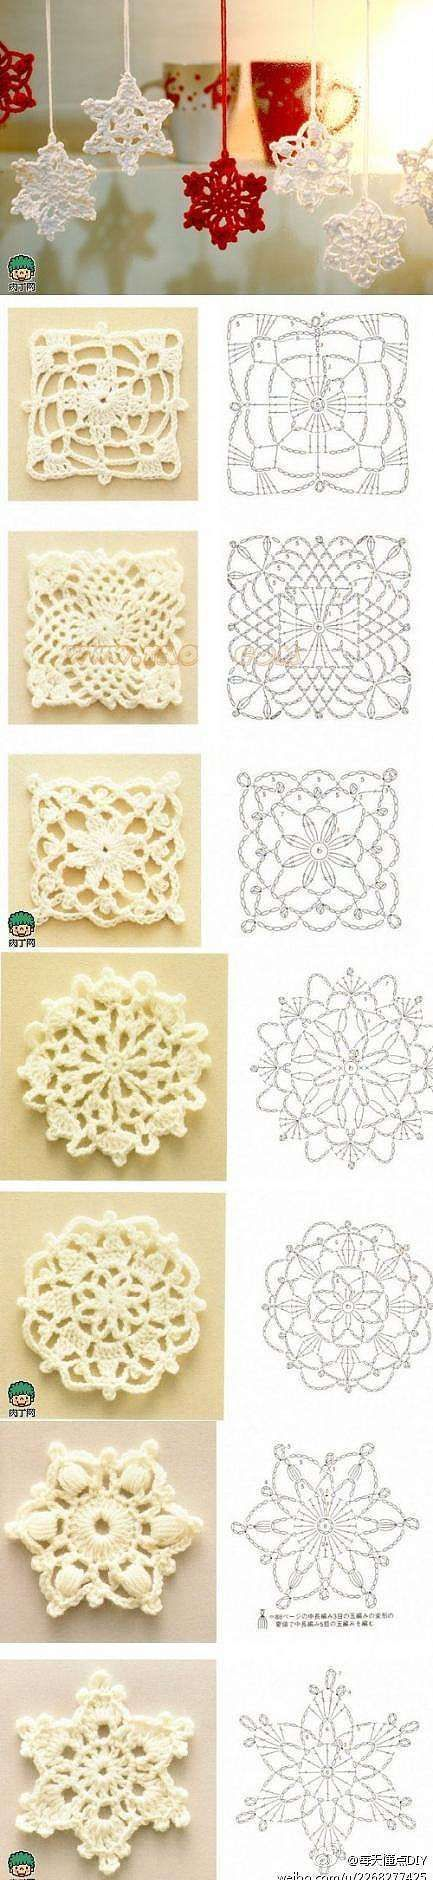 1630 best Ganchillo images on Pinterest | Crochet patterns, Book ...